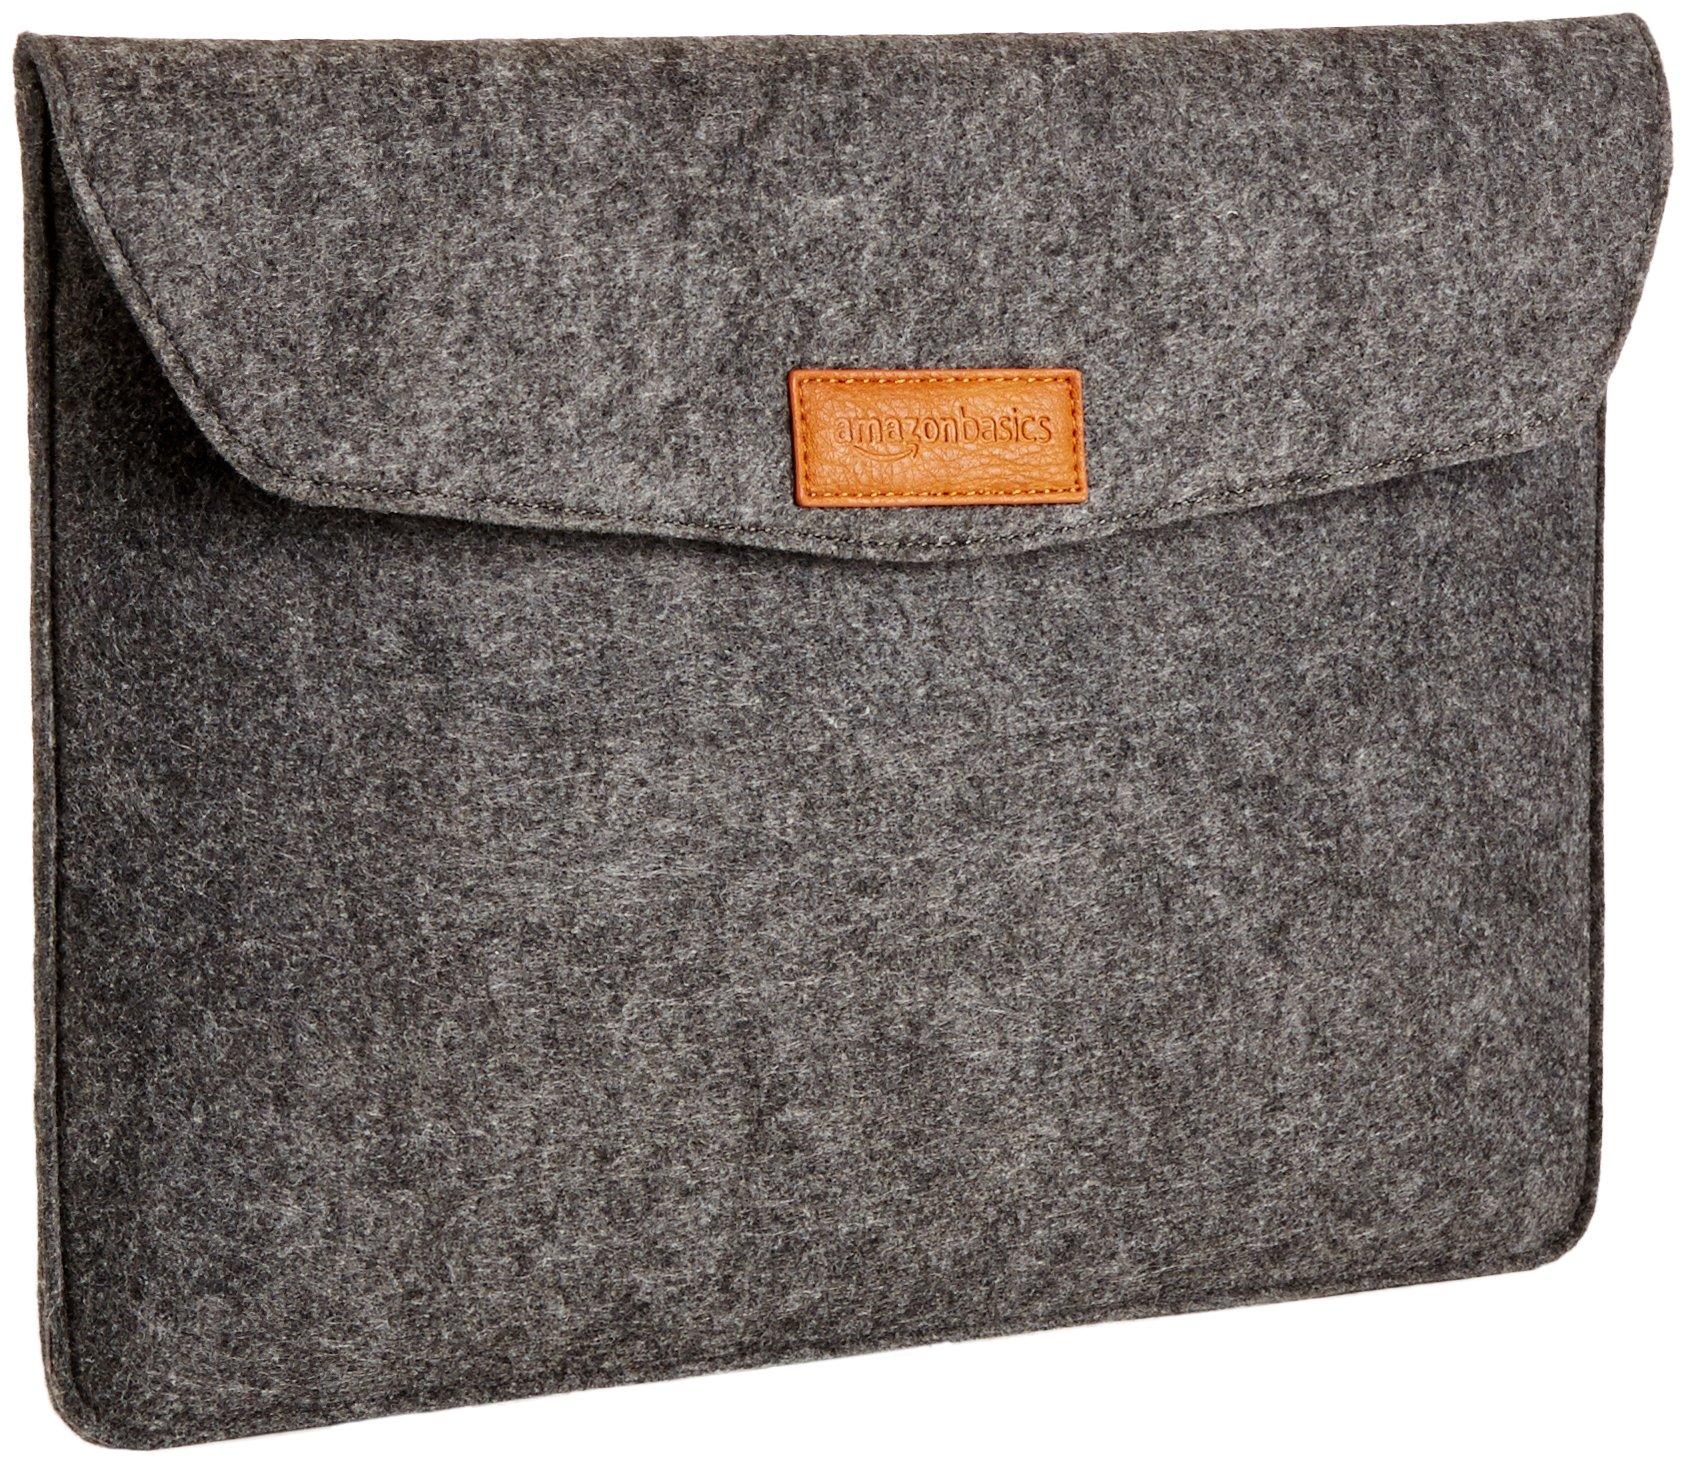 AmazonBasics 13-Inch Felt Laptop Sleeve - Charcoal by AmazonBasics